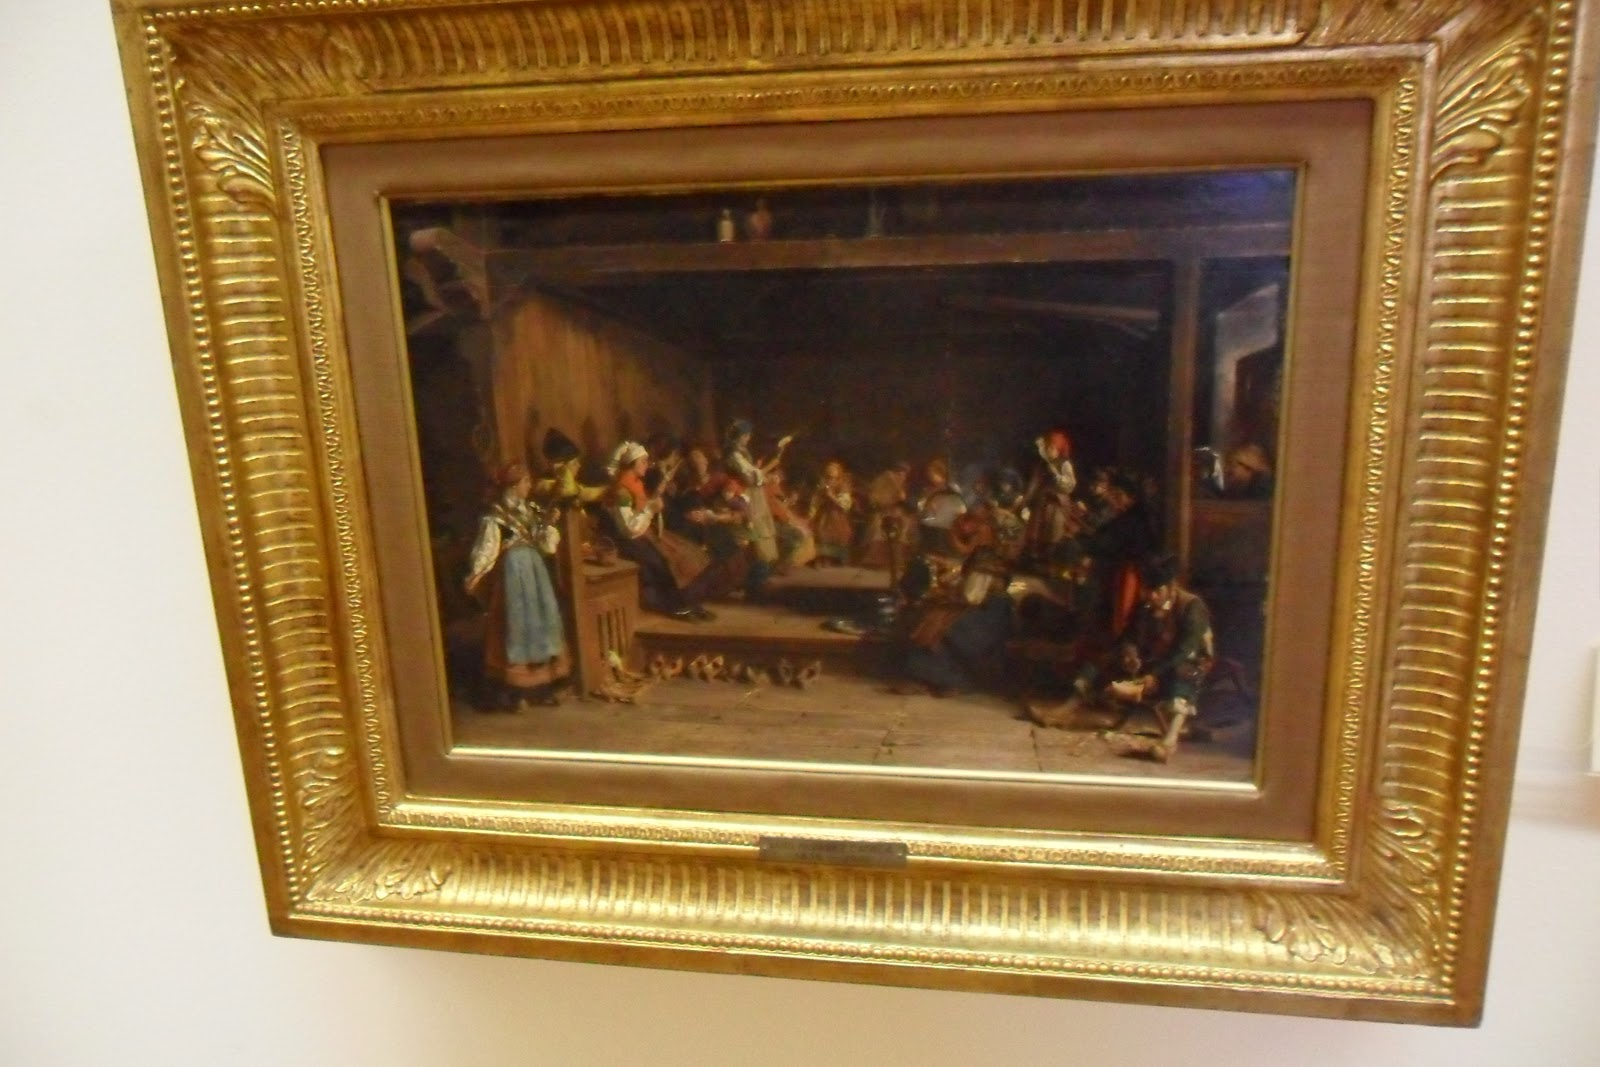 Tuttifrutti asturias vista por pintores asturianos s xix - Pintores en asturias ...